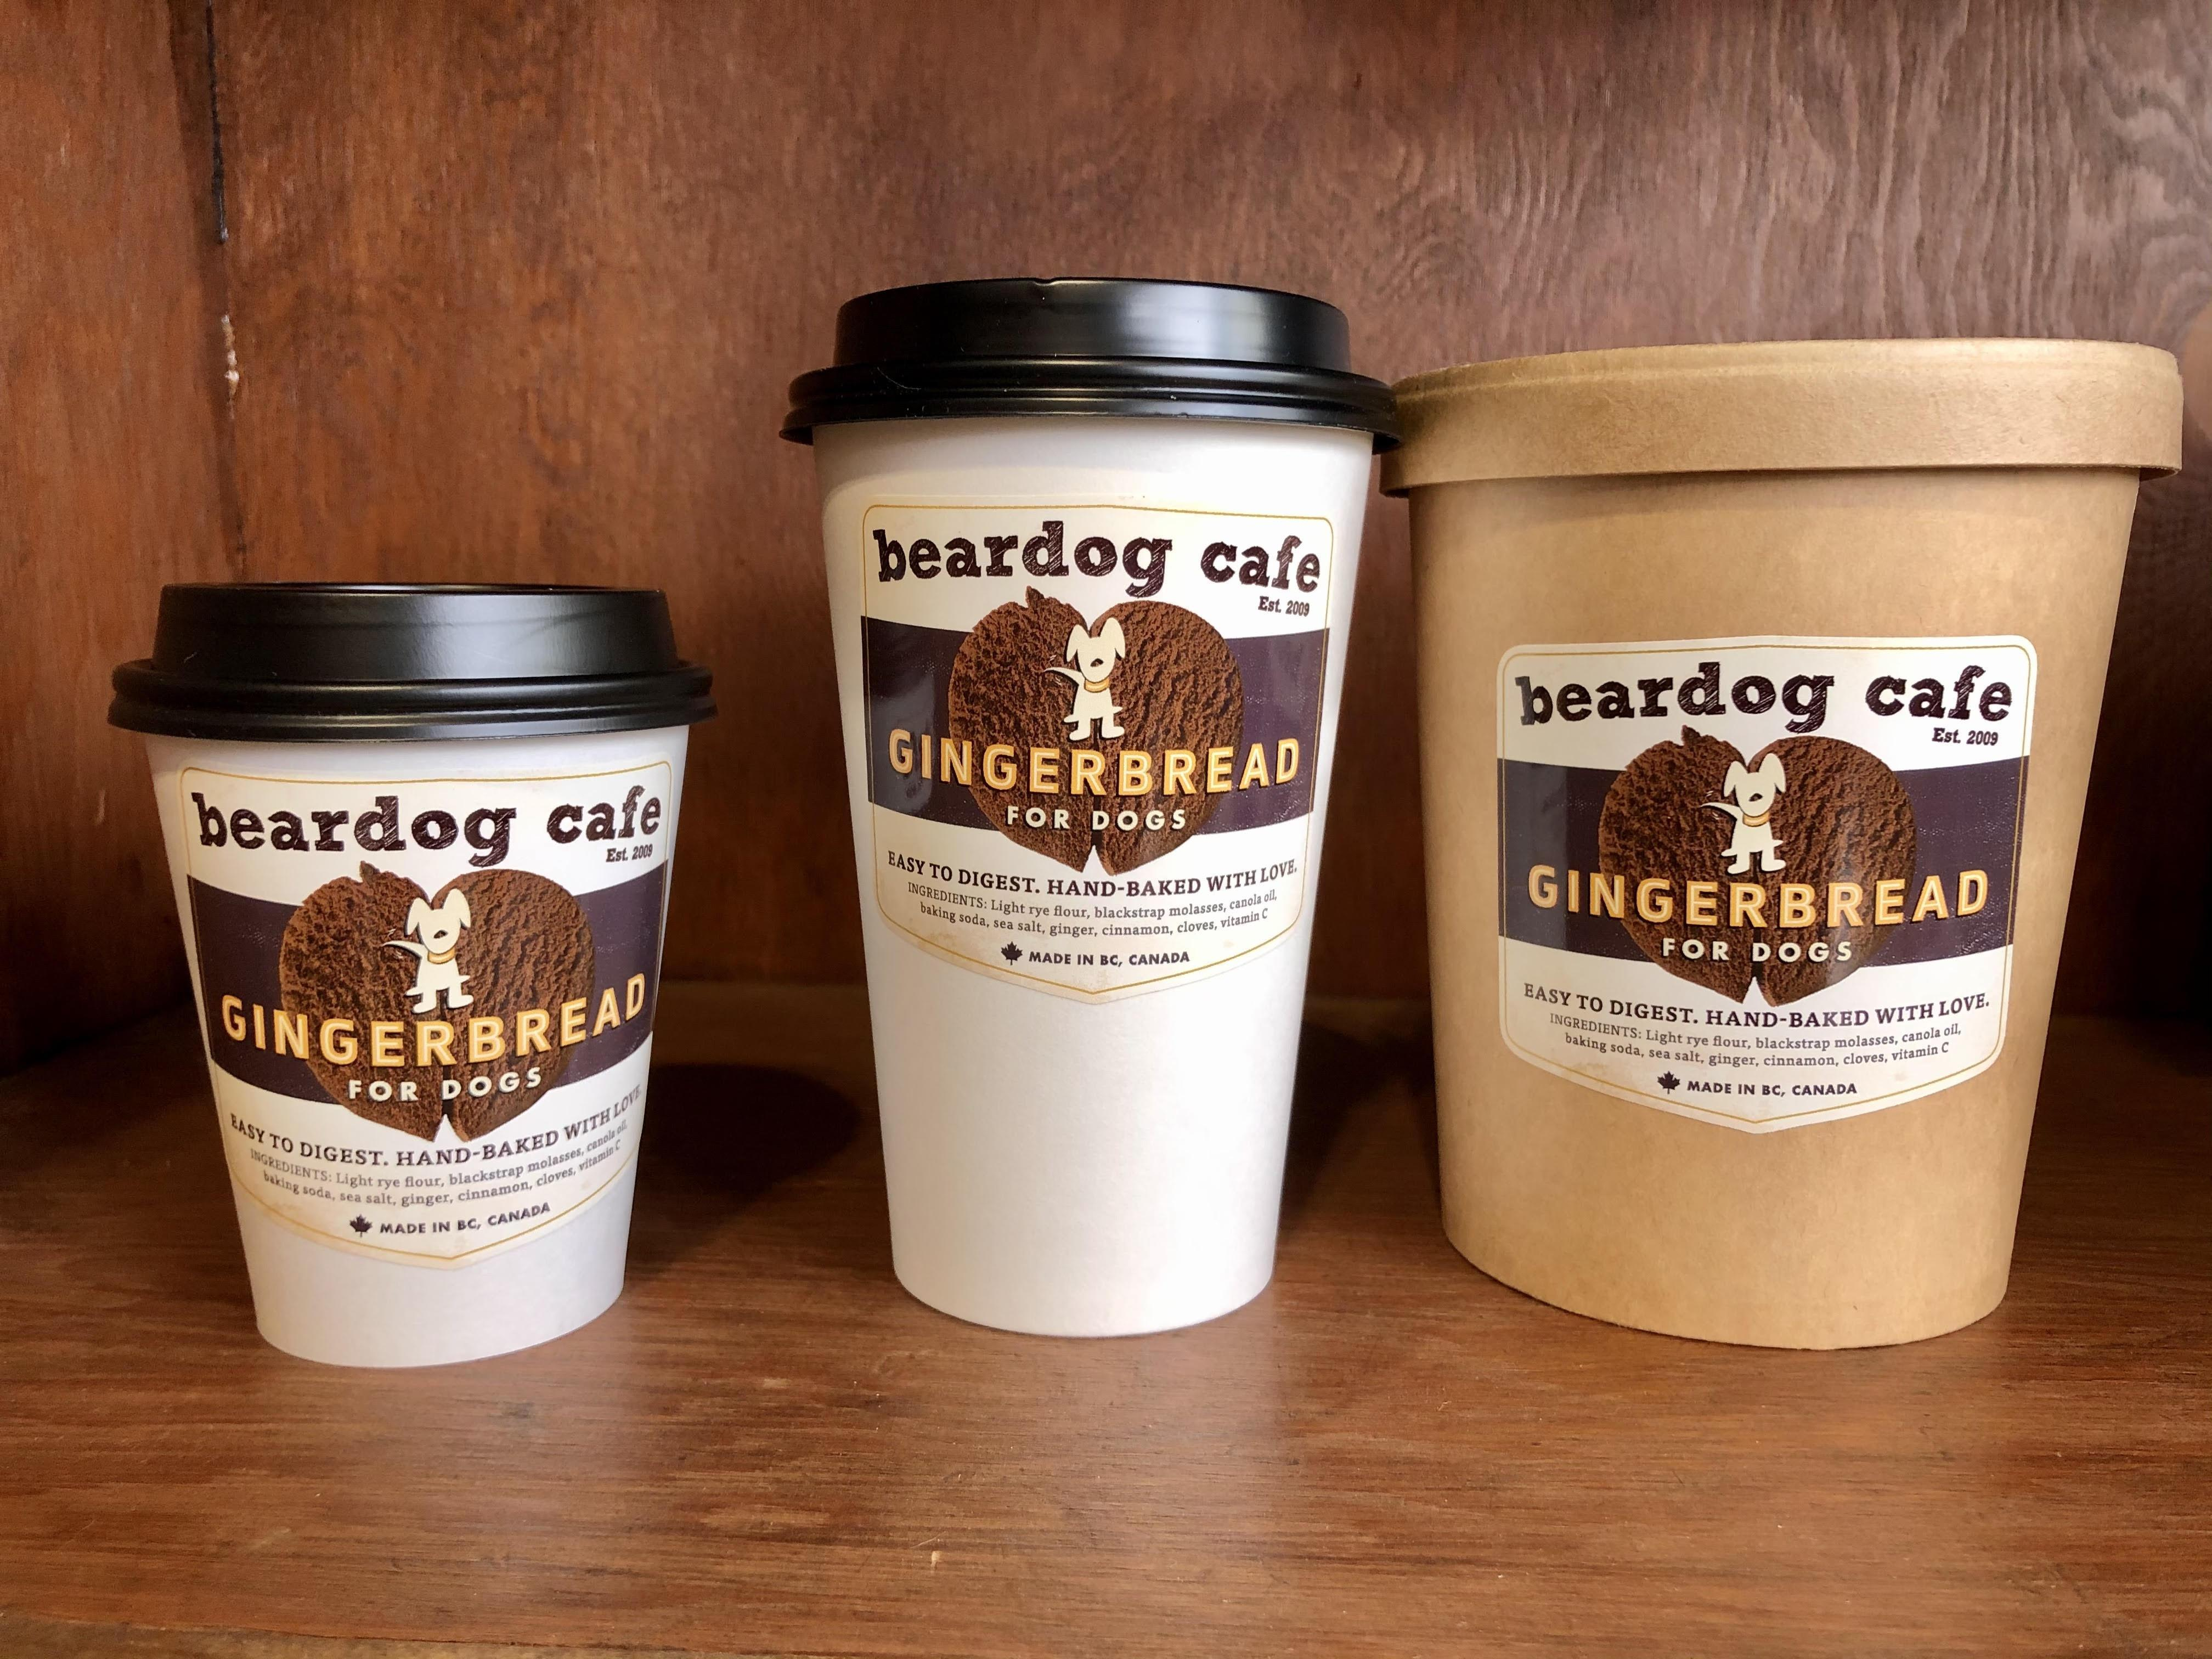 Beardog Cafe Pumpkin Gingerbread Cookies Dog Treats Image